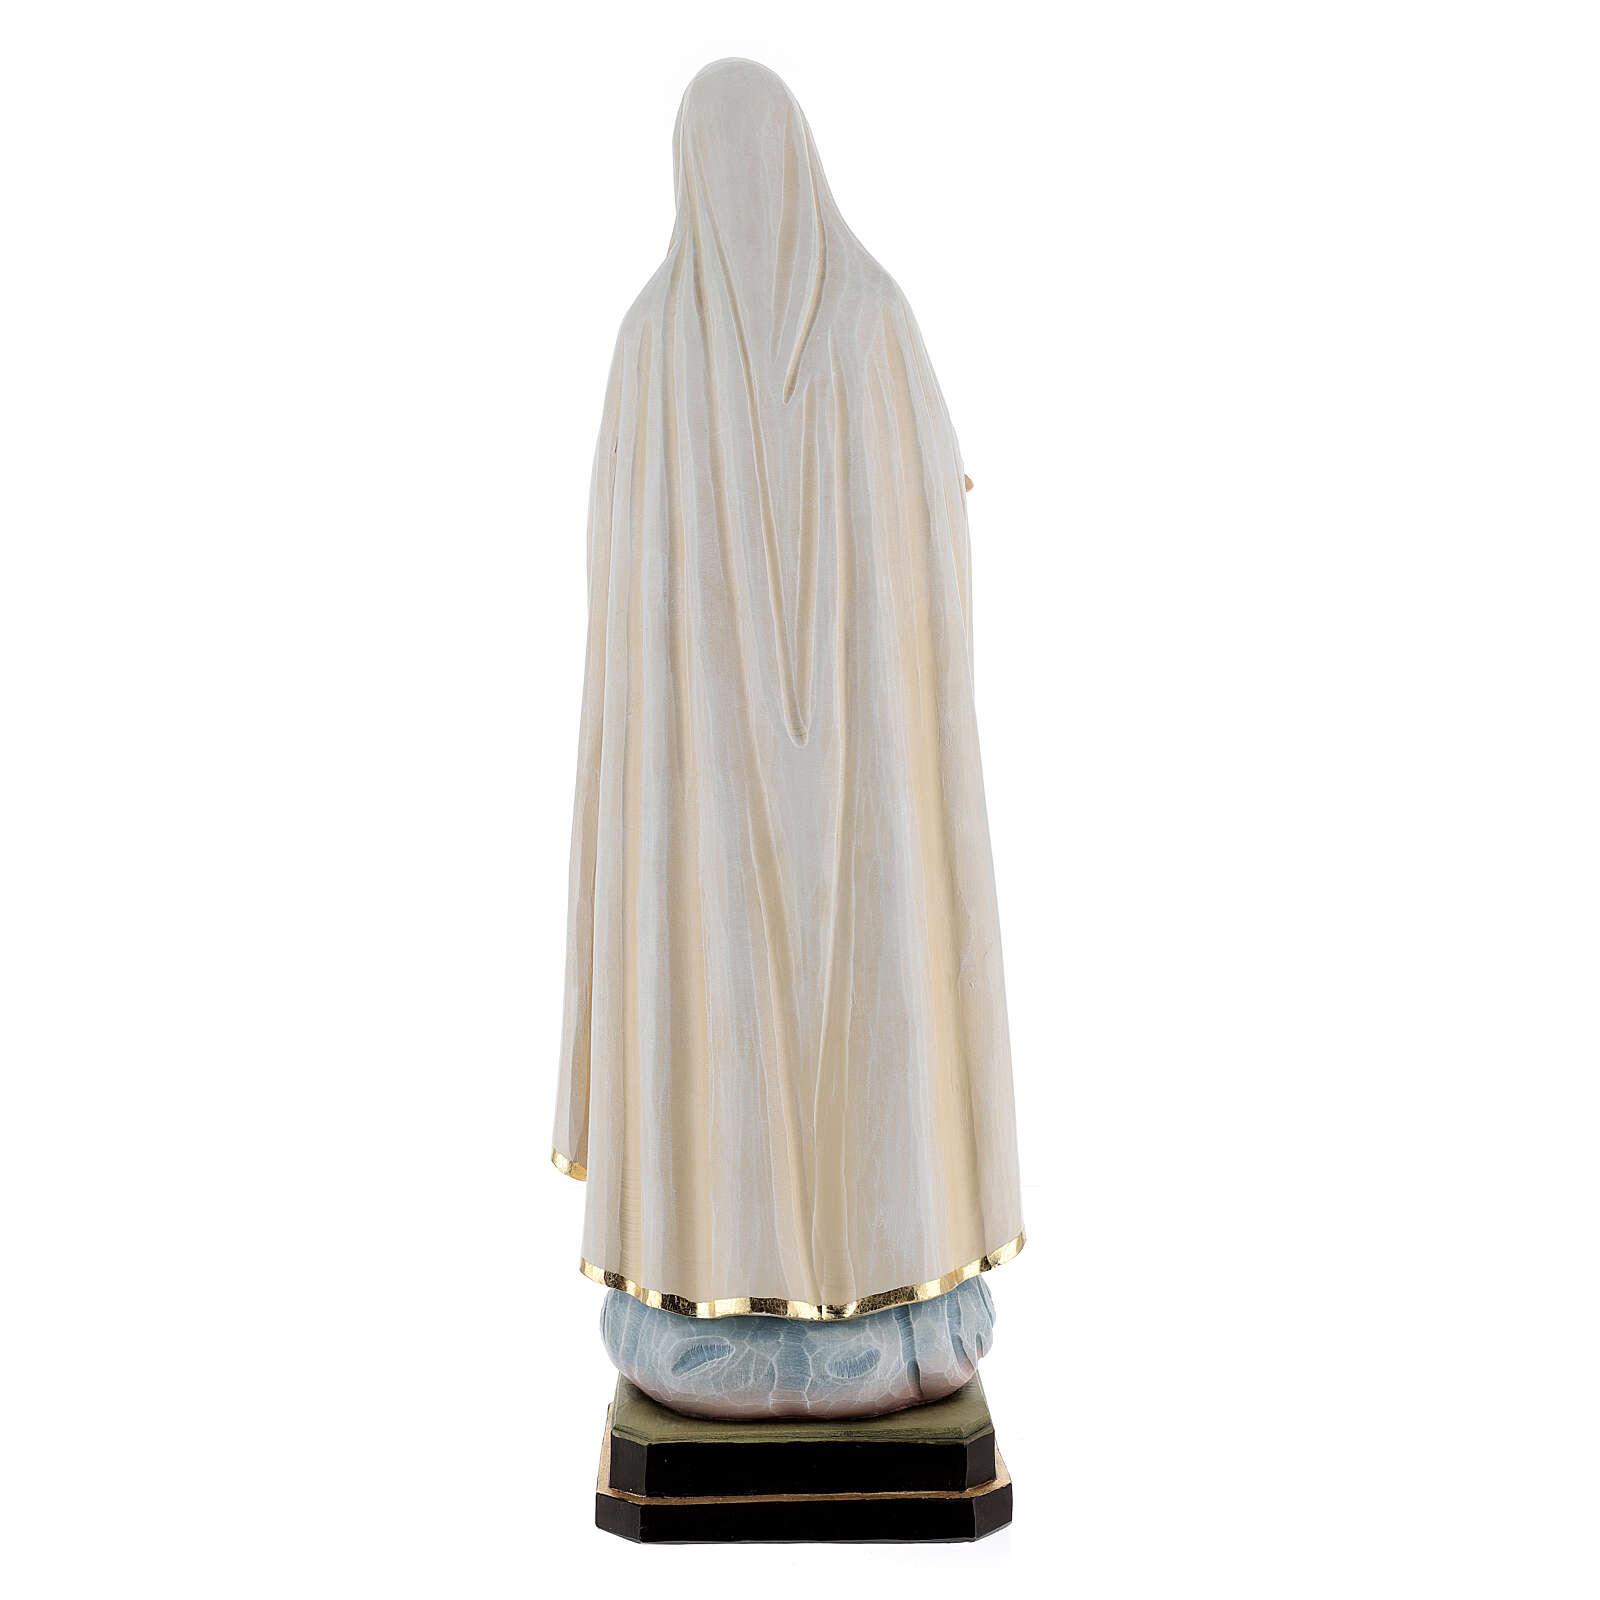 Estatua madera Virgen de Fátima. 4